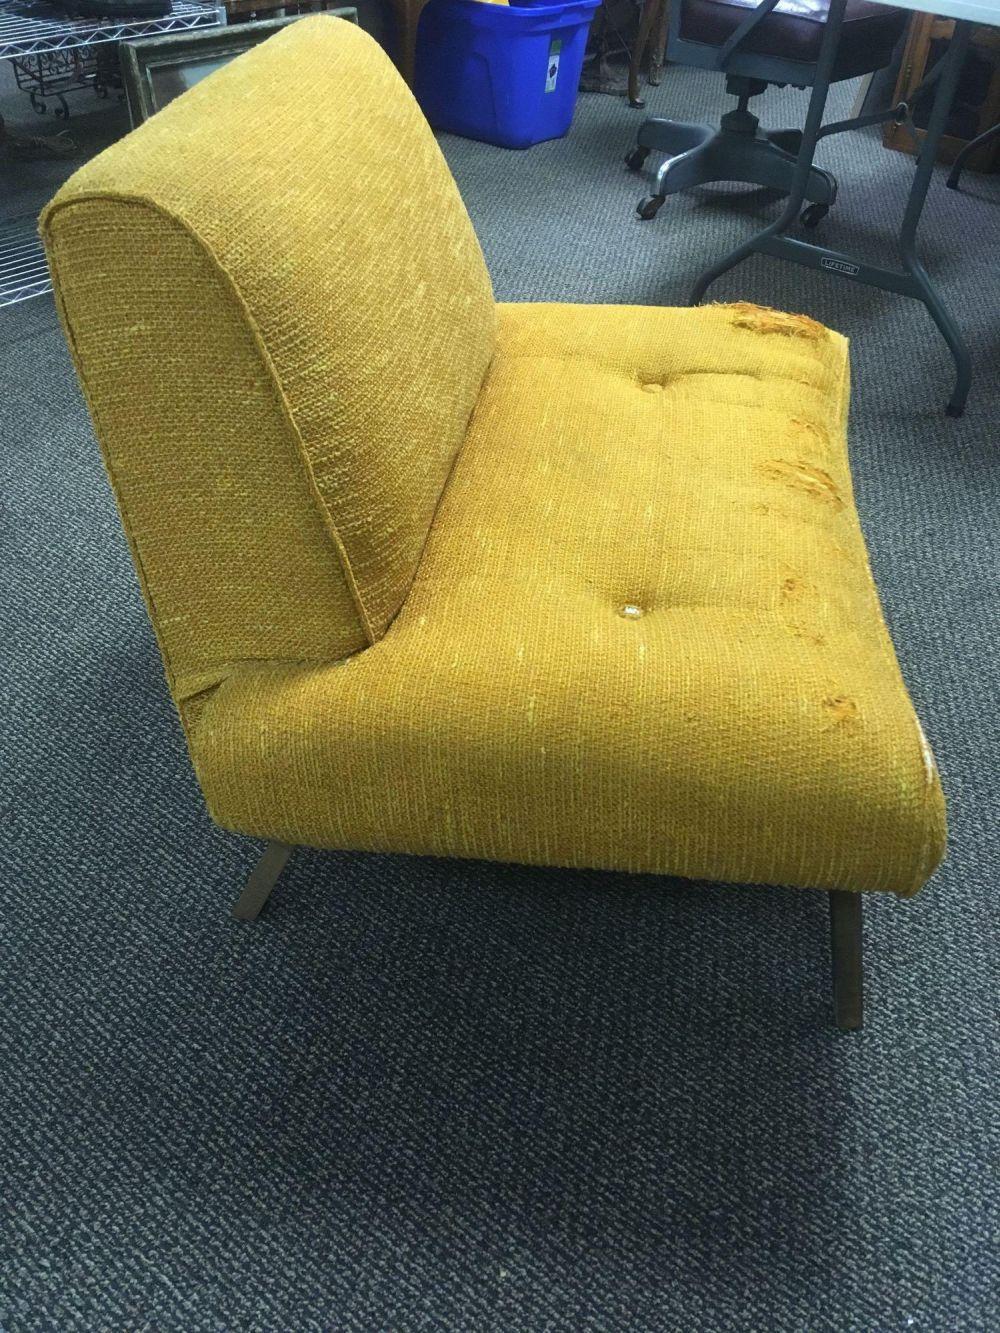 Lot 452: Mid-Century Fabric Chair